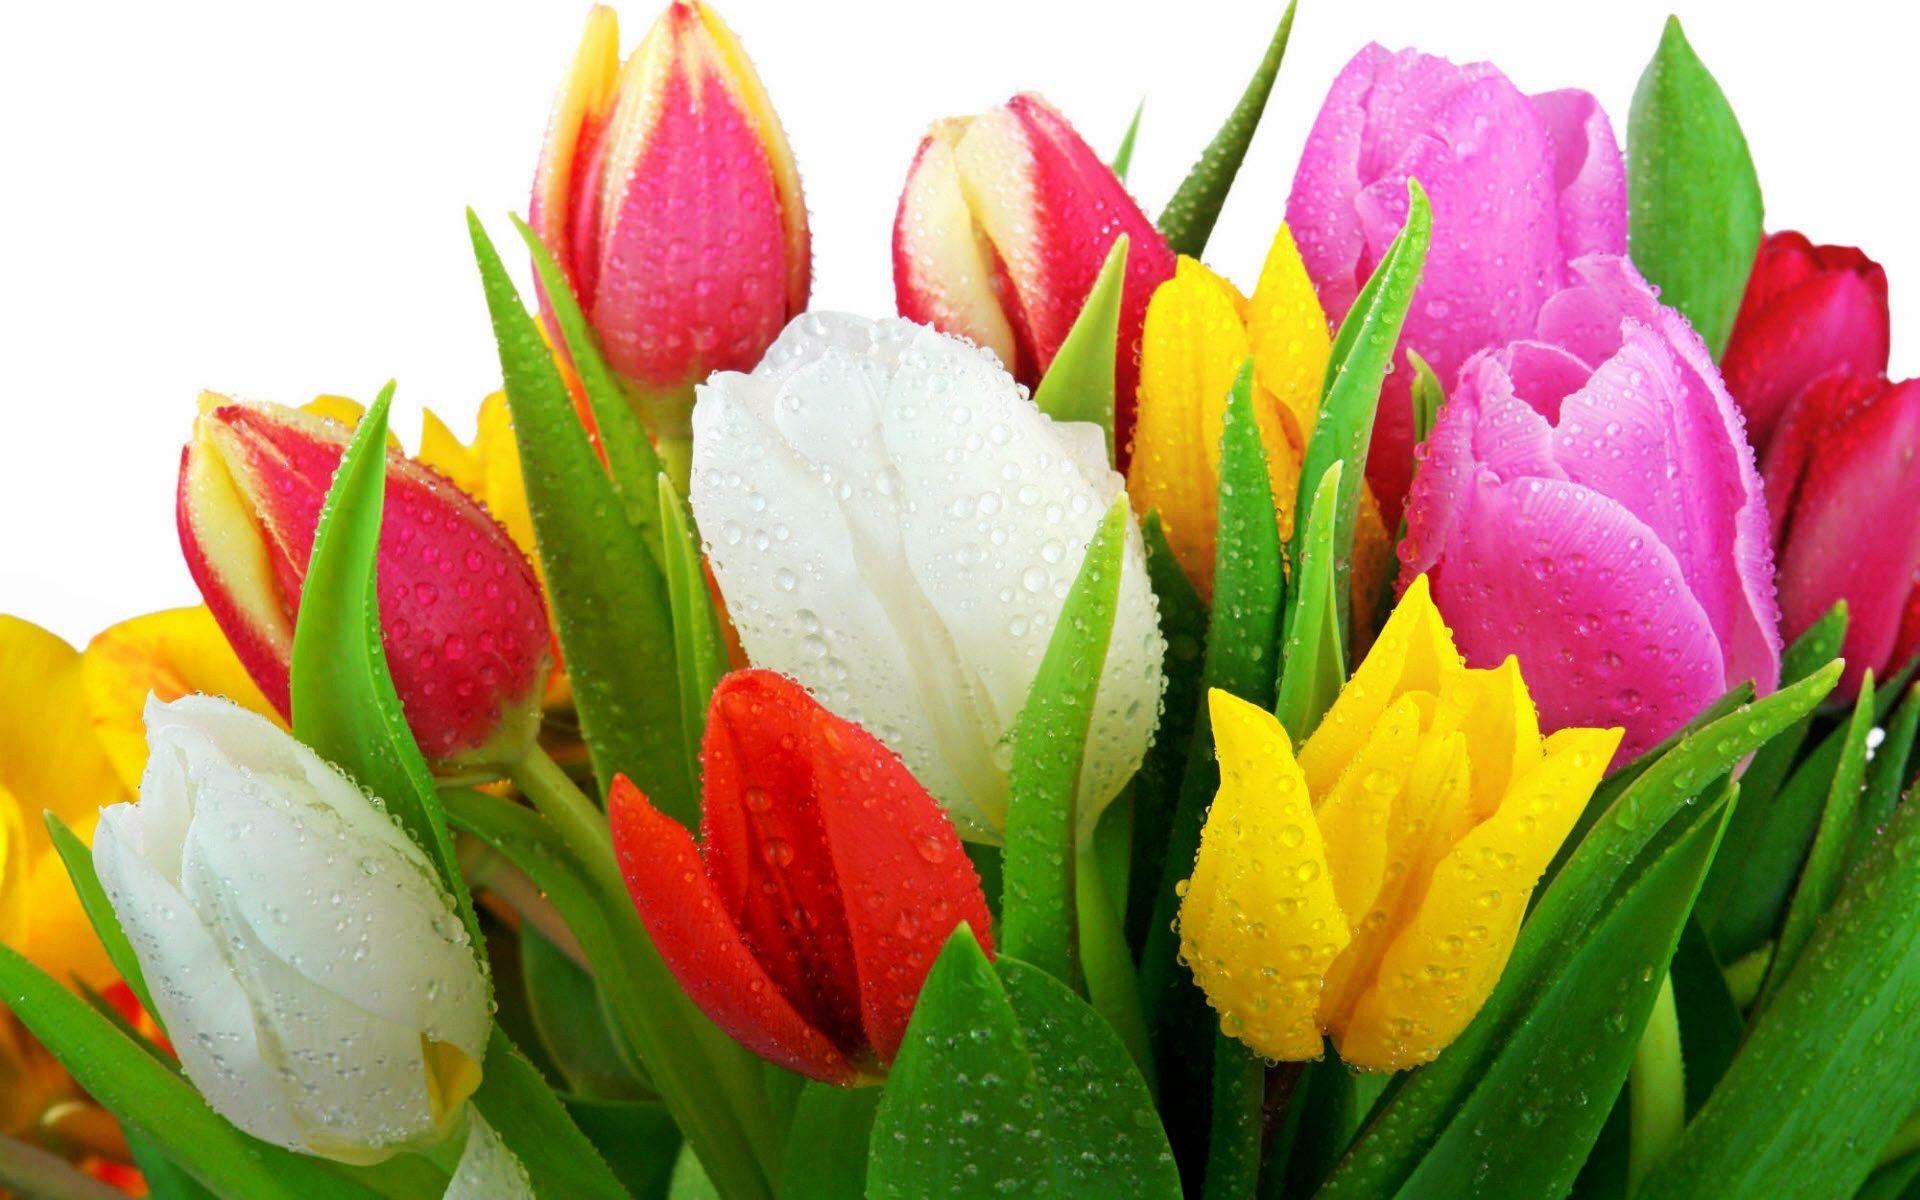 Tulip Flower Wallpaper Tulip Flower Pictures Free New Wallpapers Tulips Flowers Fresh Tulips Flowers